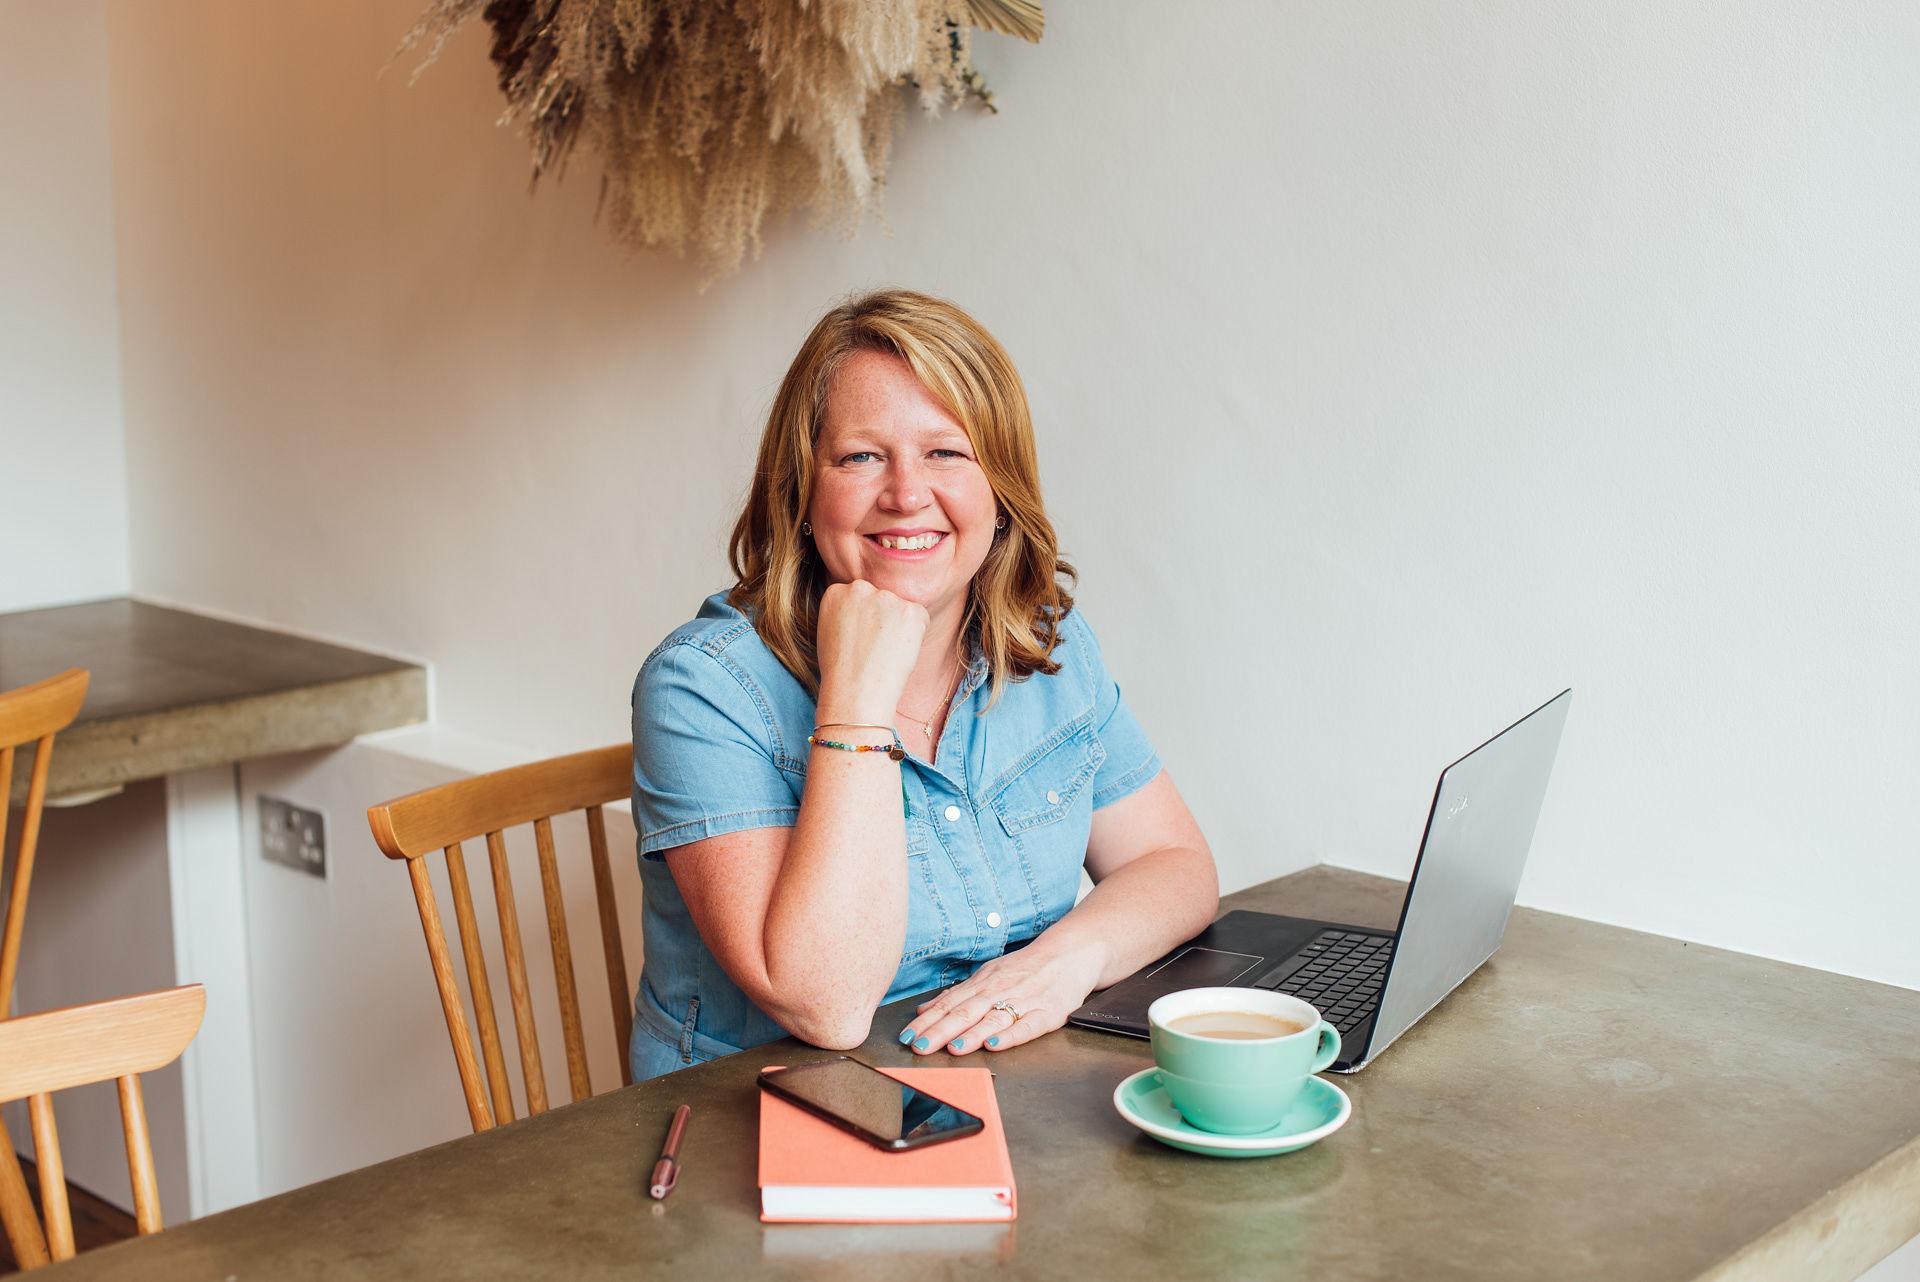 Ruth-Buckingham-Kandu-Marketing-Content-Web-36